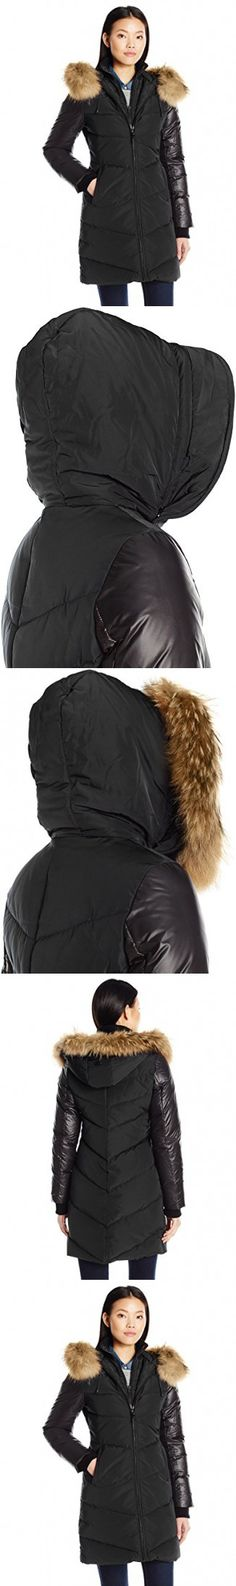 RUD by RUDSAK Women's Mya Zip Front Down Coat with Fur Hood Trim, Black, M